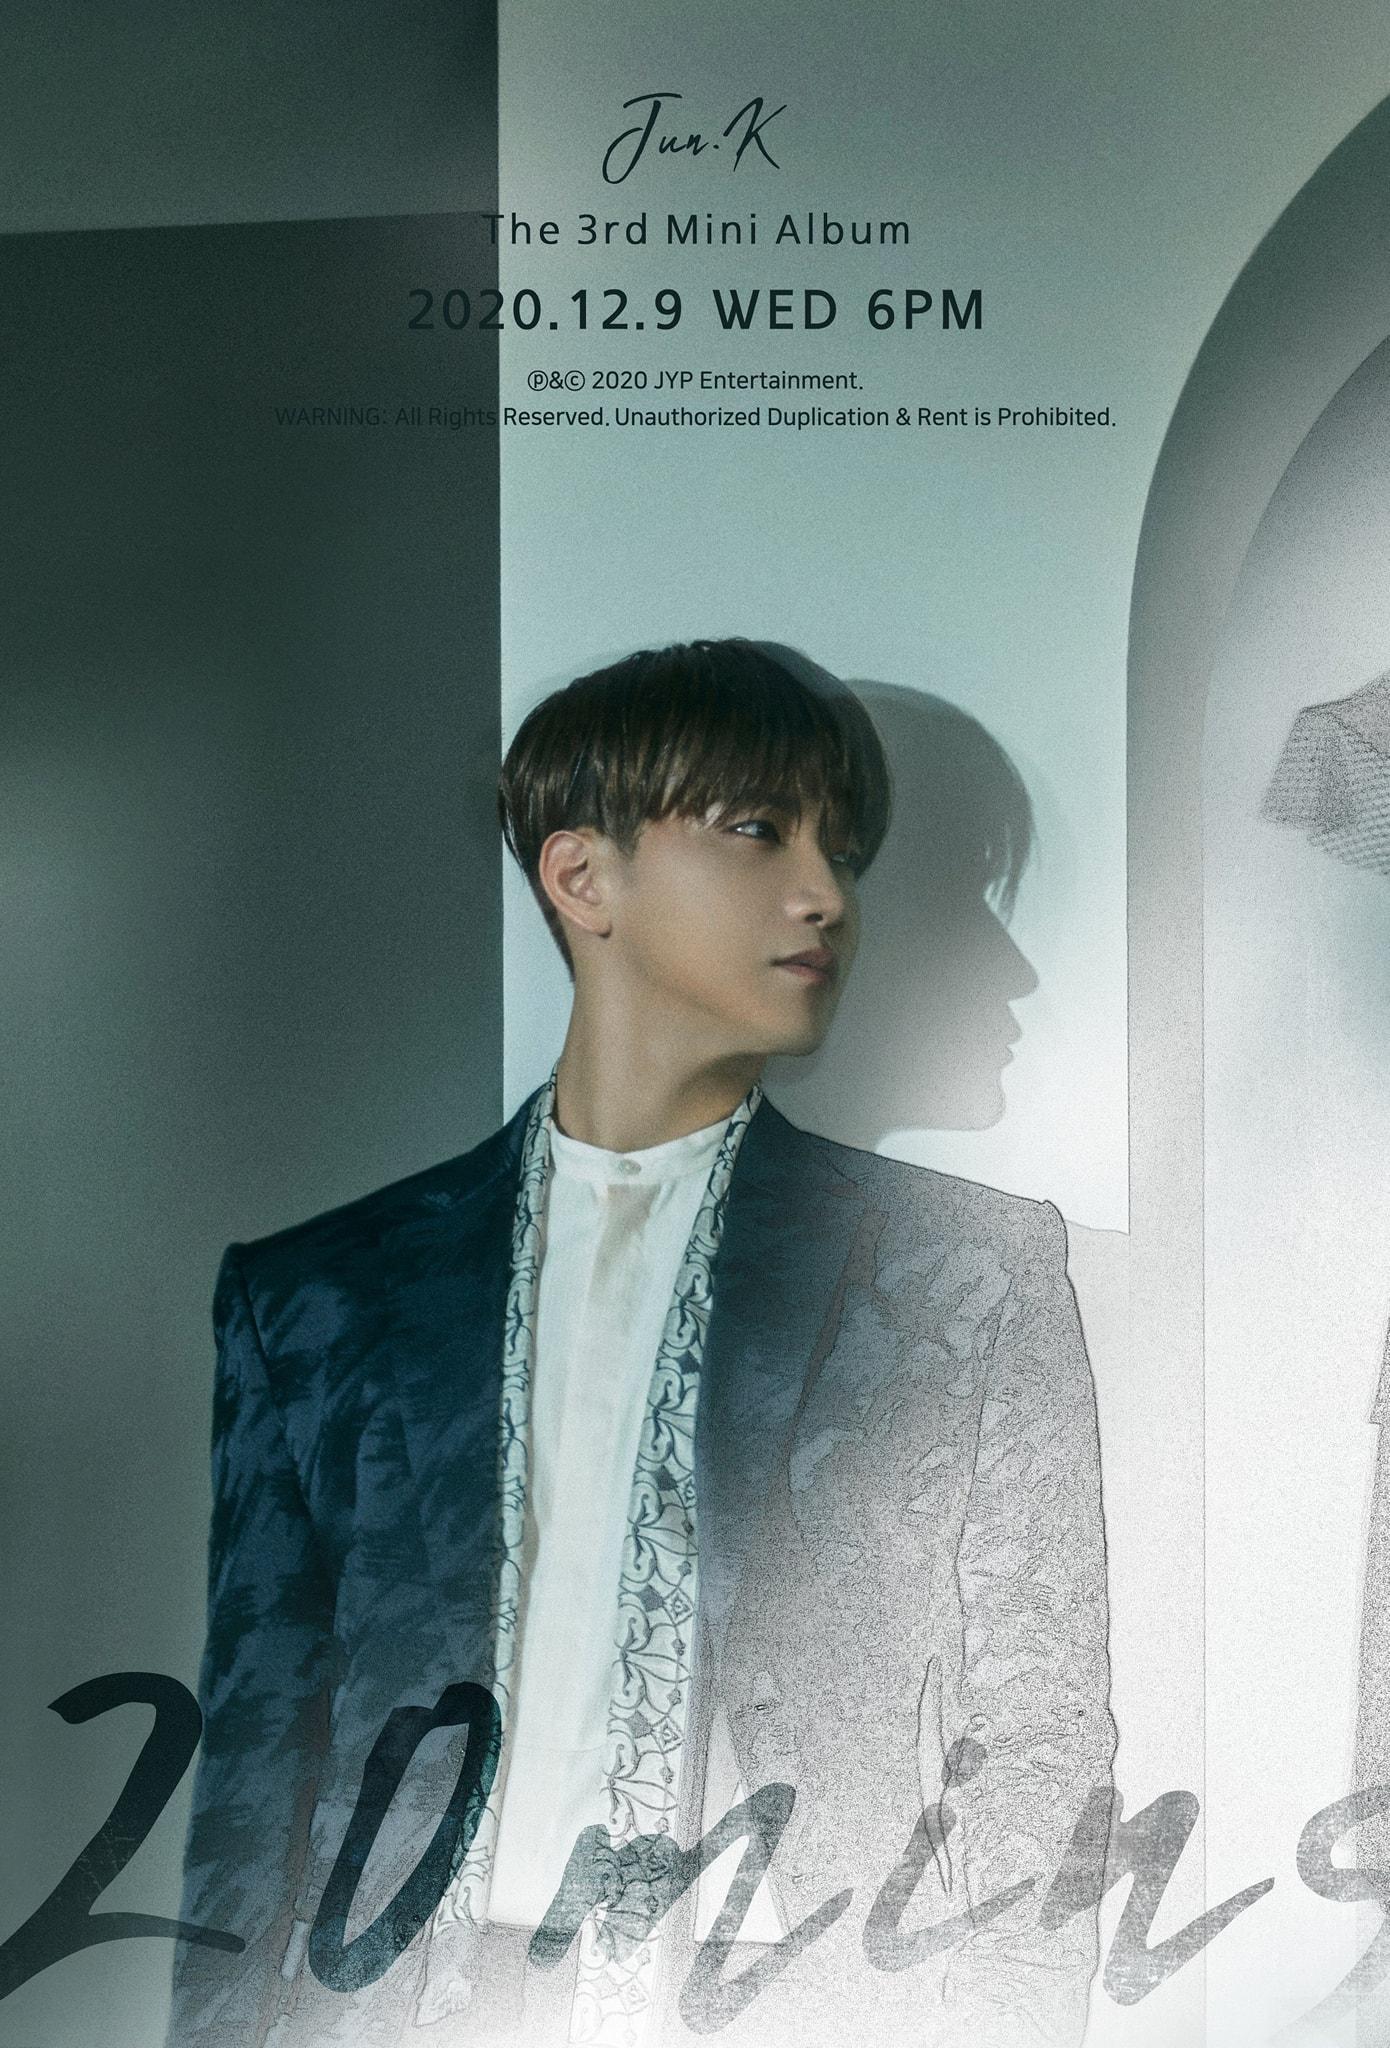 2pm-jun-k-to-make-comeback-with-3rd-mini-album-20mins-on-december-9